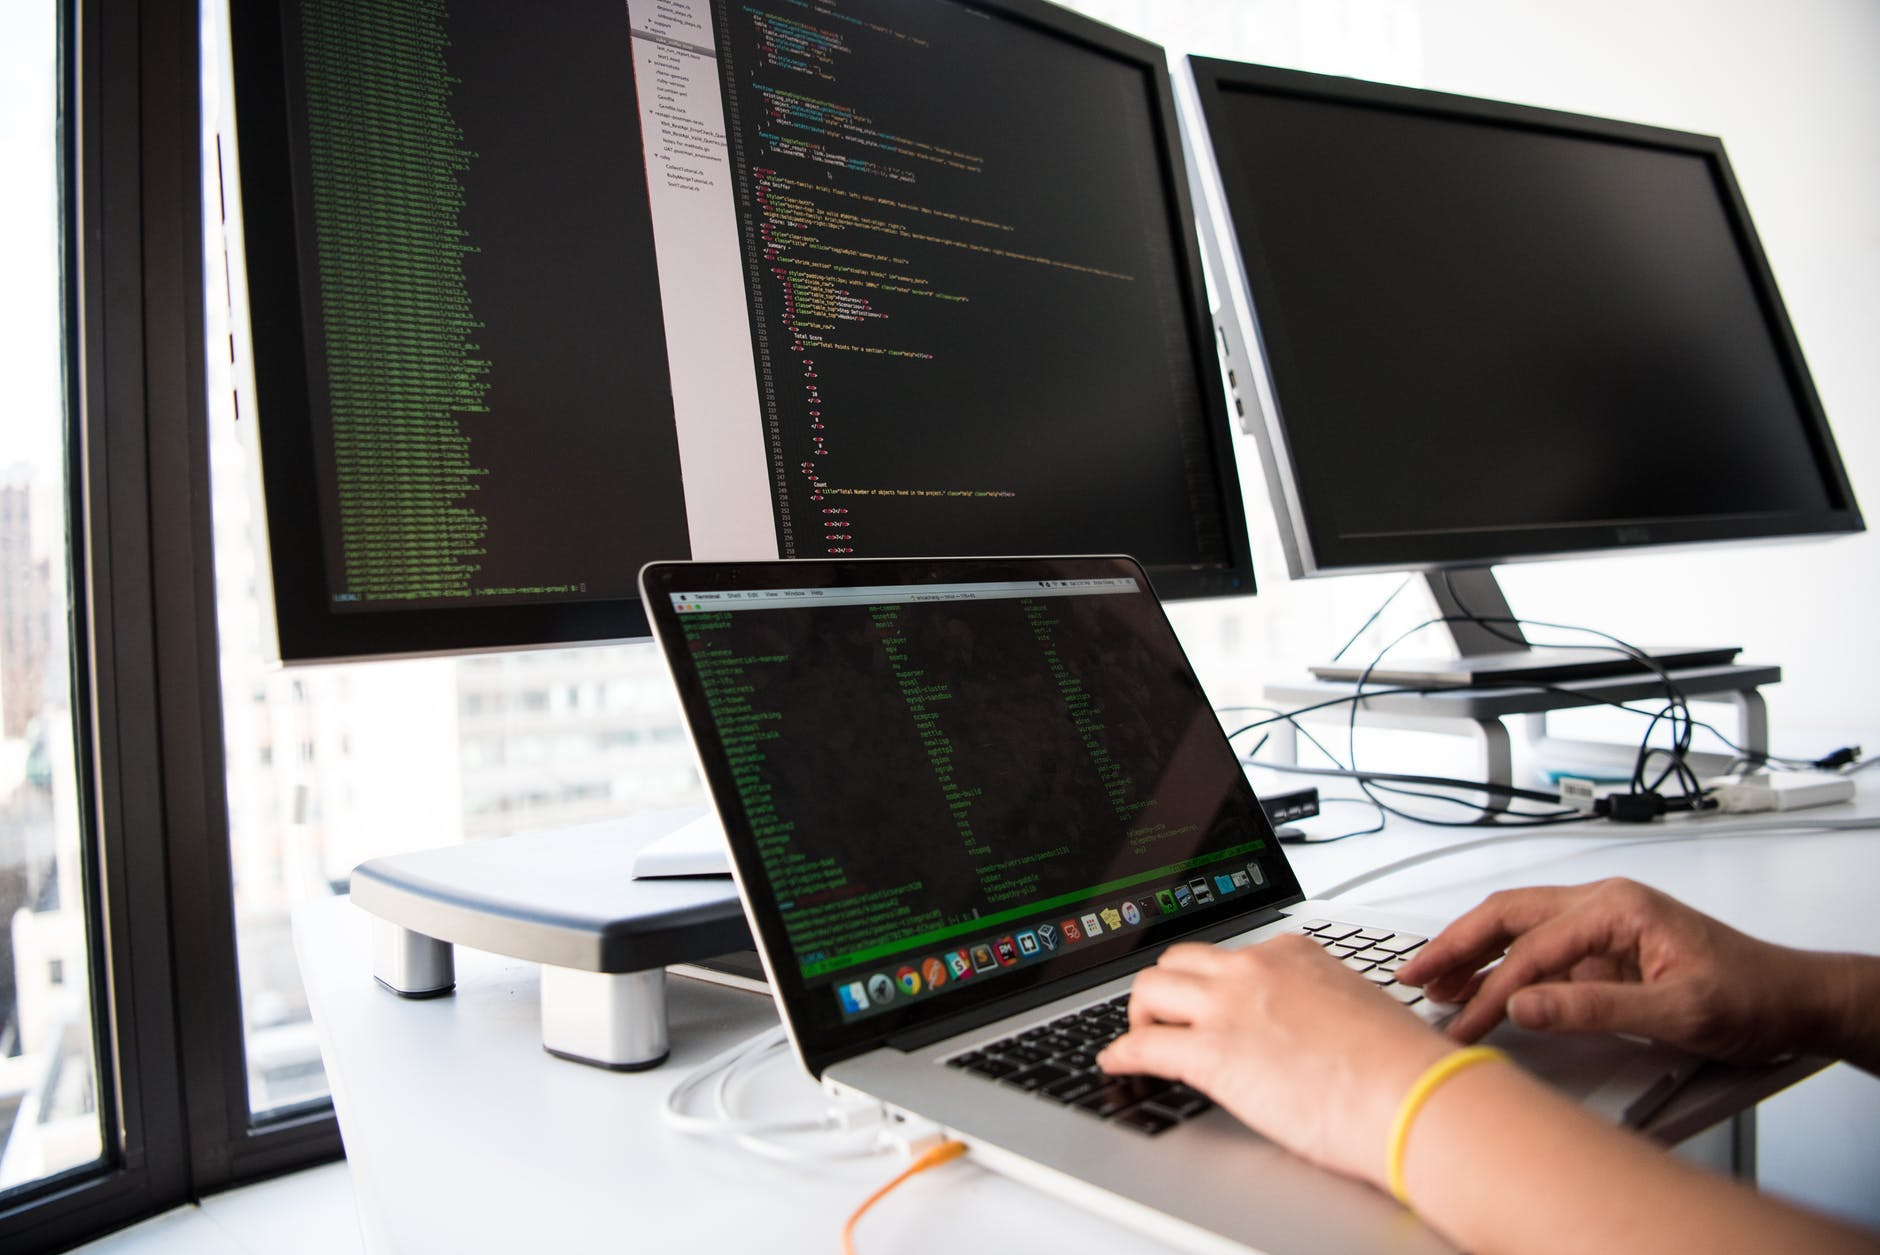 Using technology to gain an edge